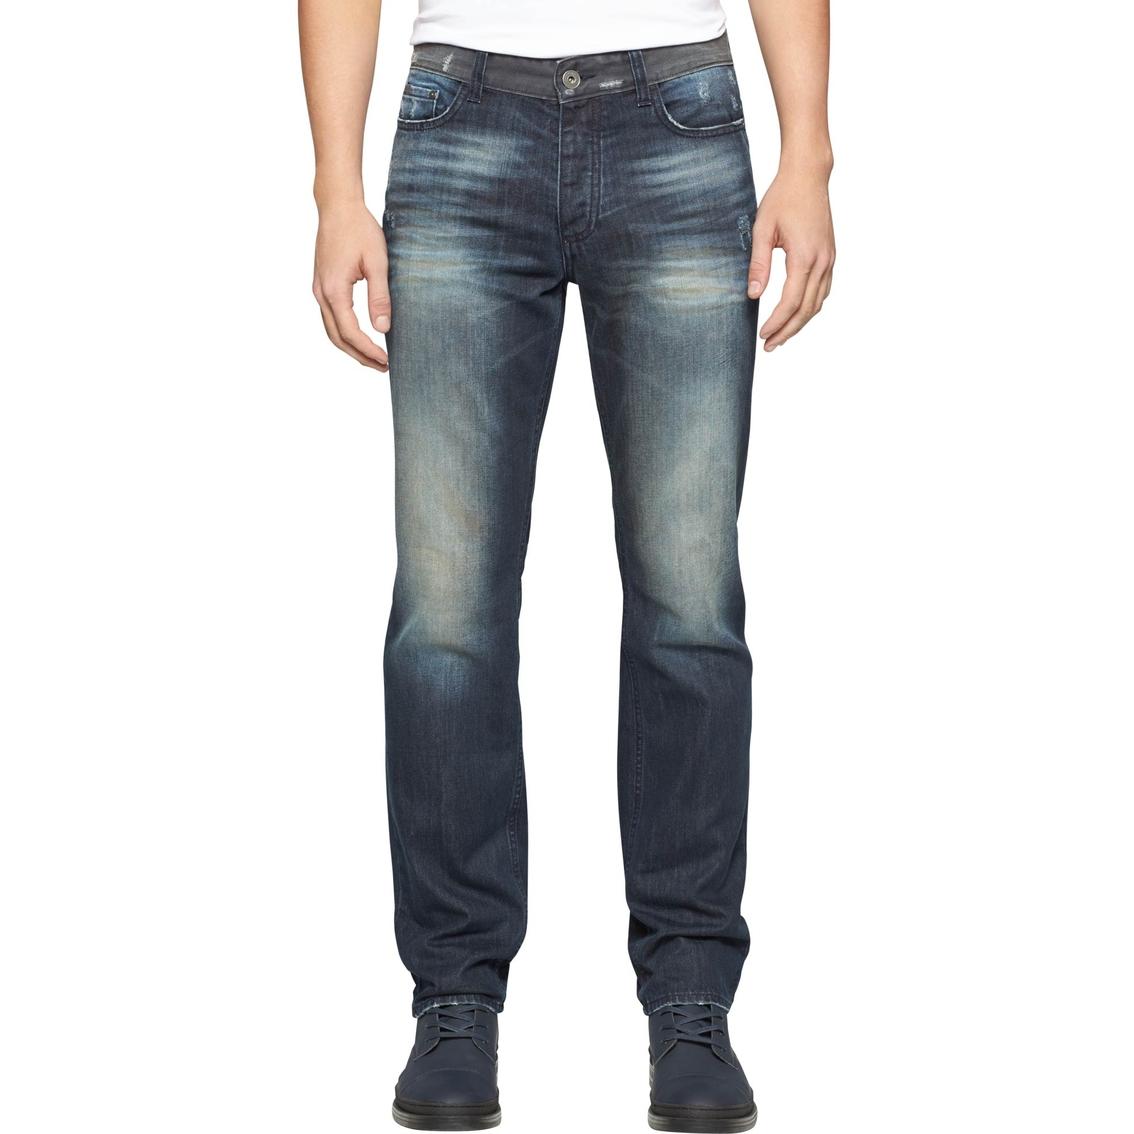 calvin klein jeans slim straight leg jeans jeans. Black Bedroom Furniture Sets. Home Design Ideas